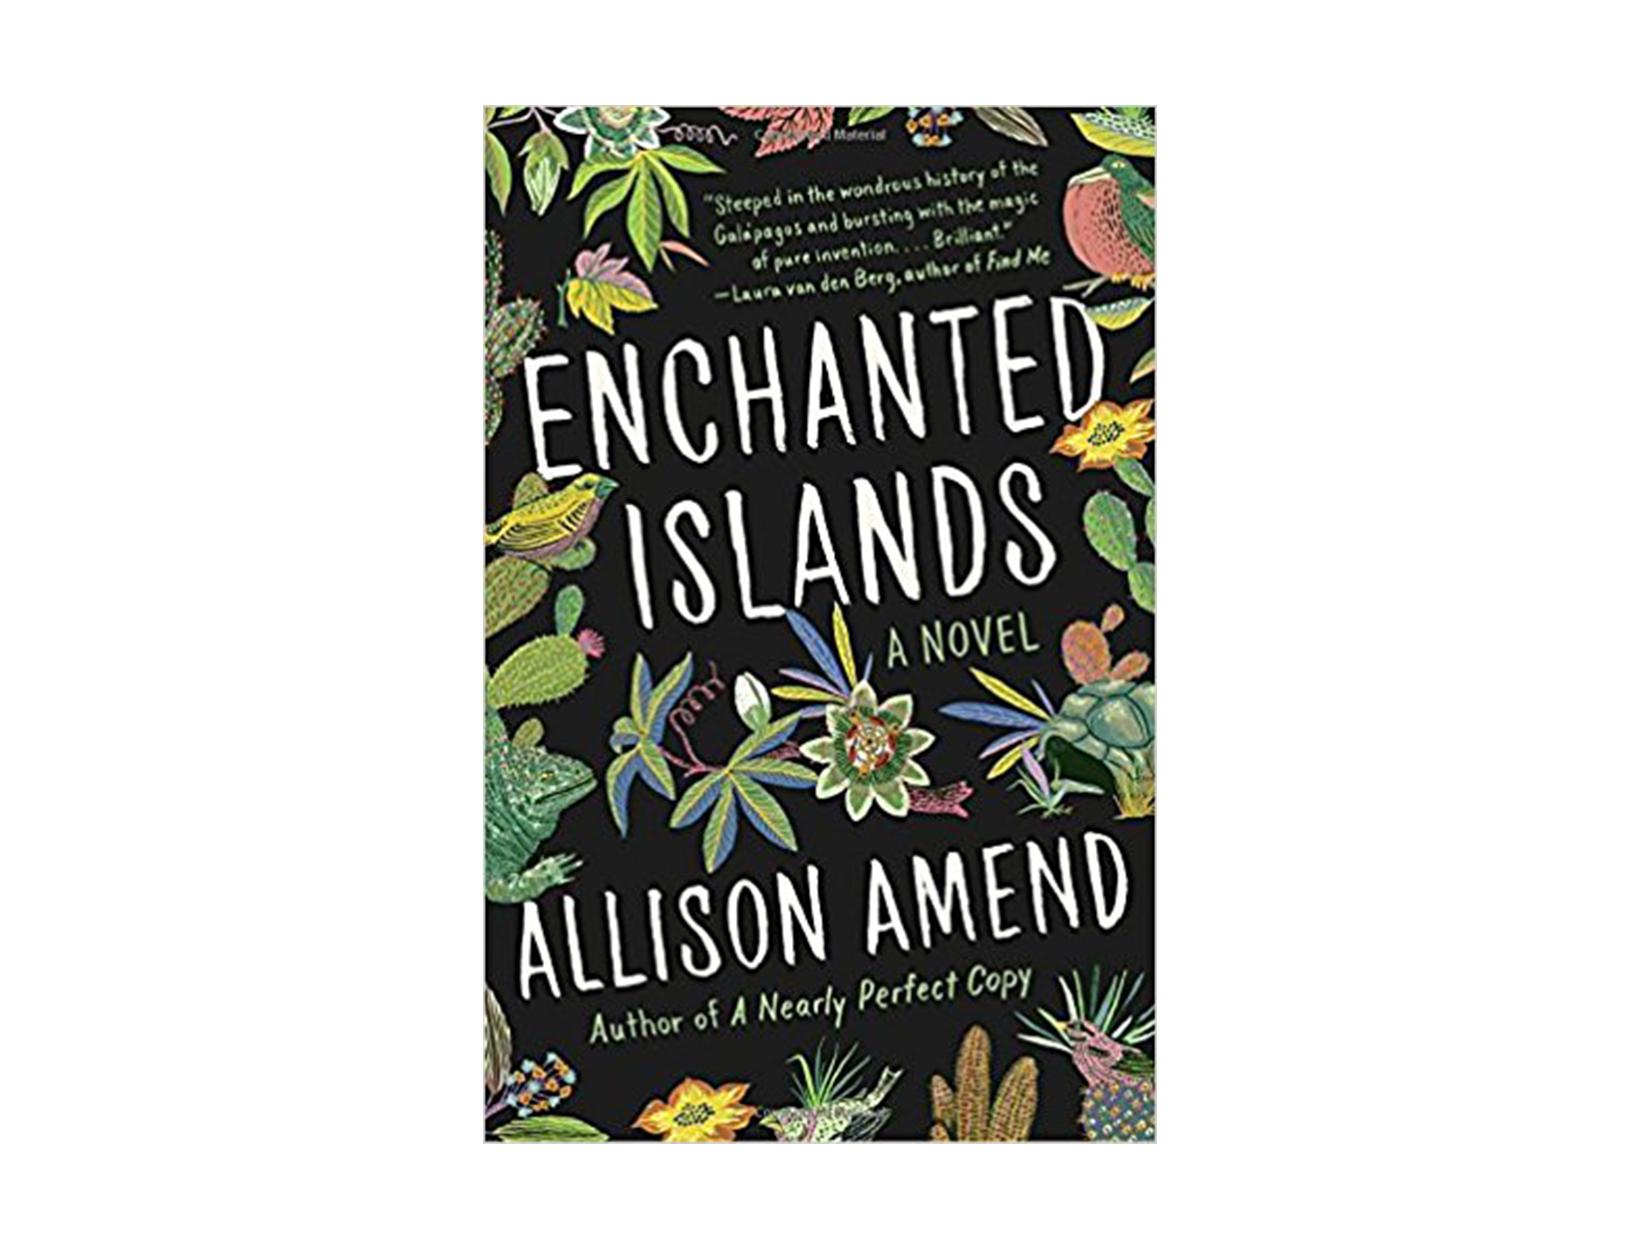 Enchanted Islands by Allison Amend